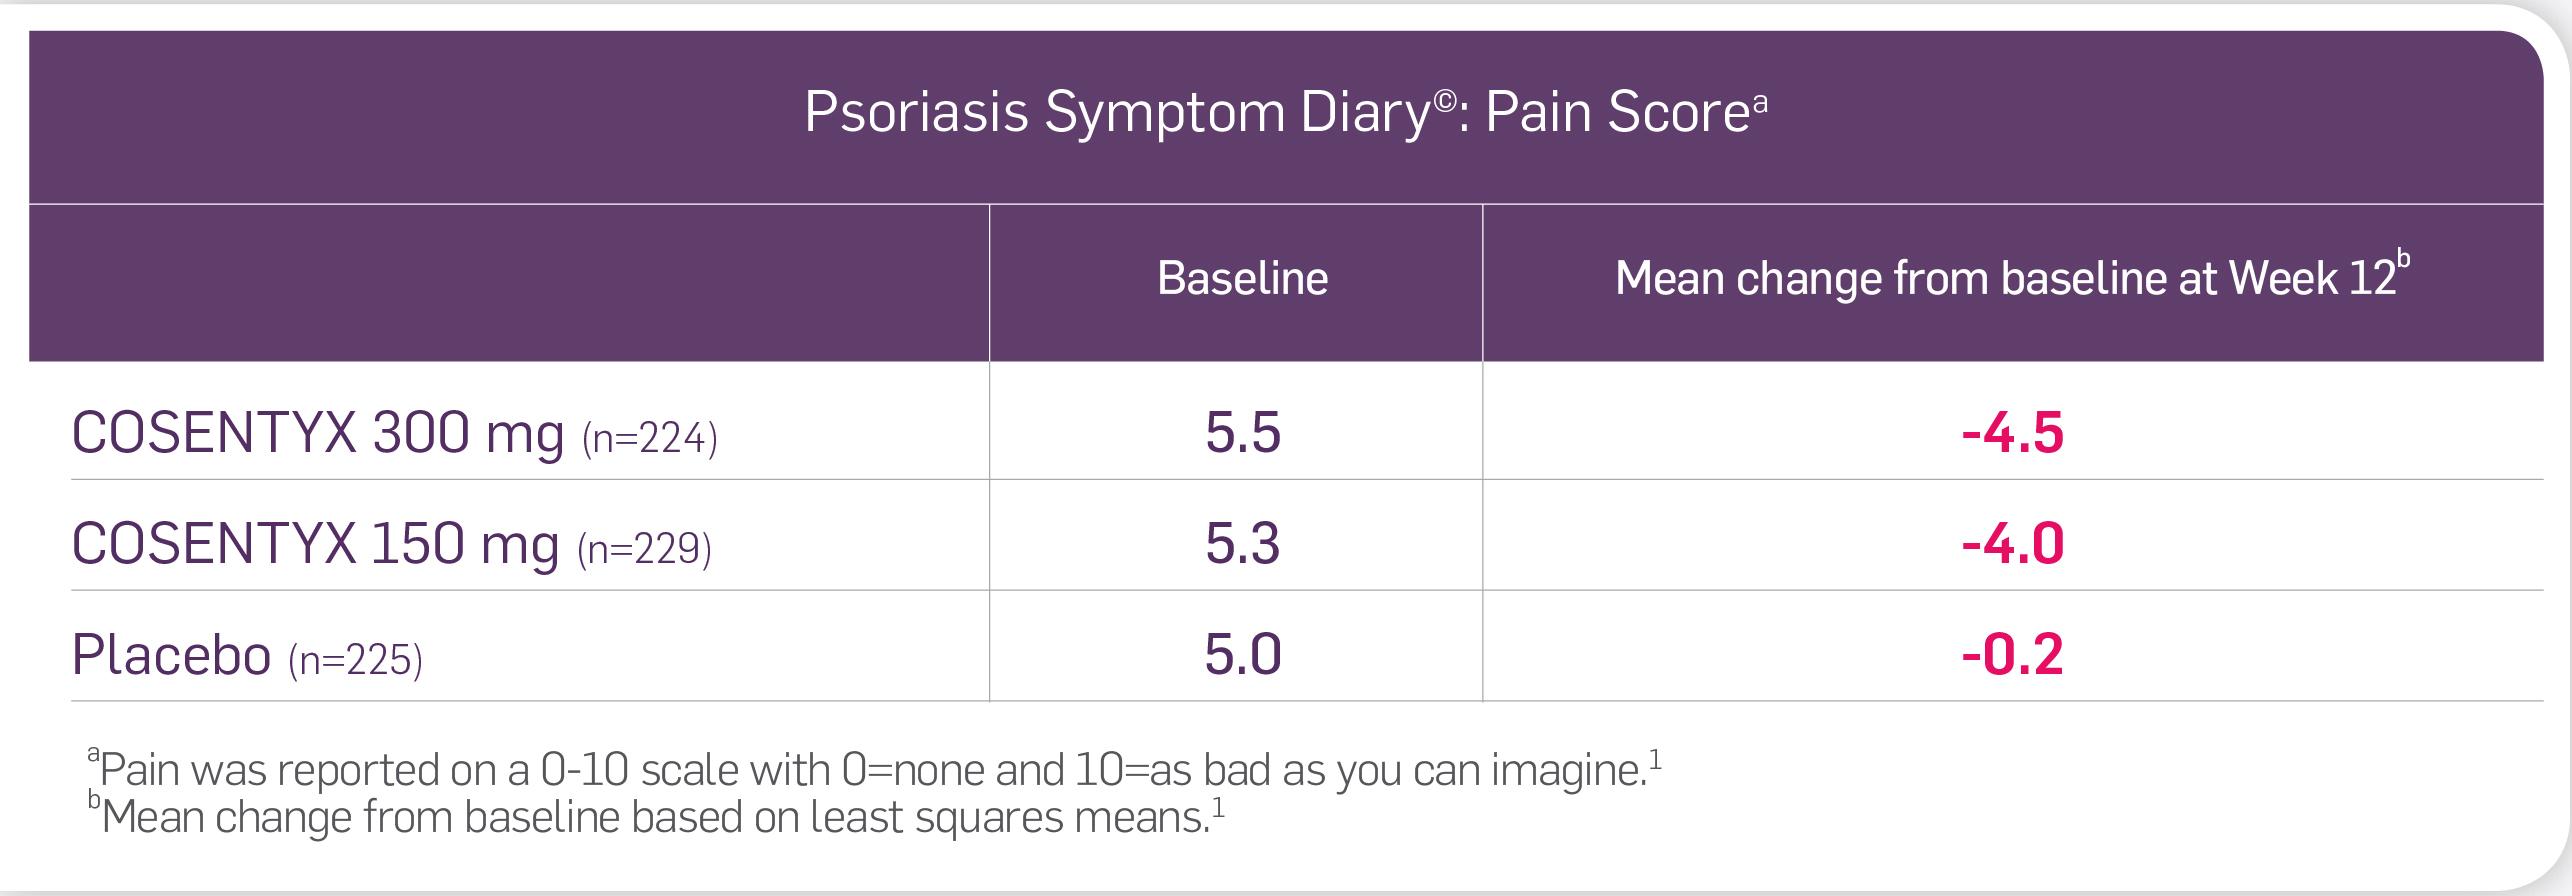 psoriasis symptom and sign diary)